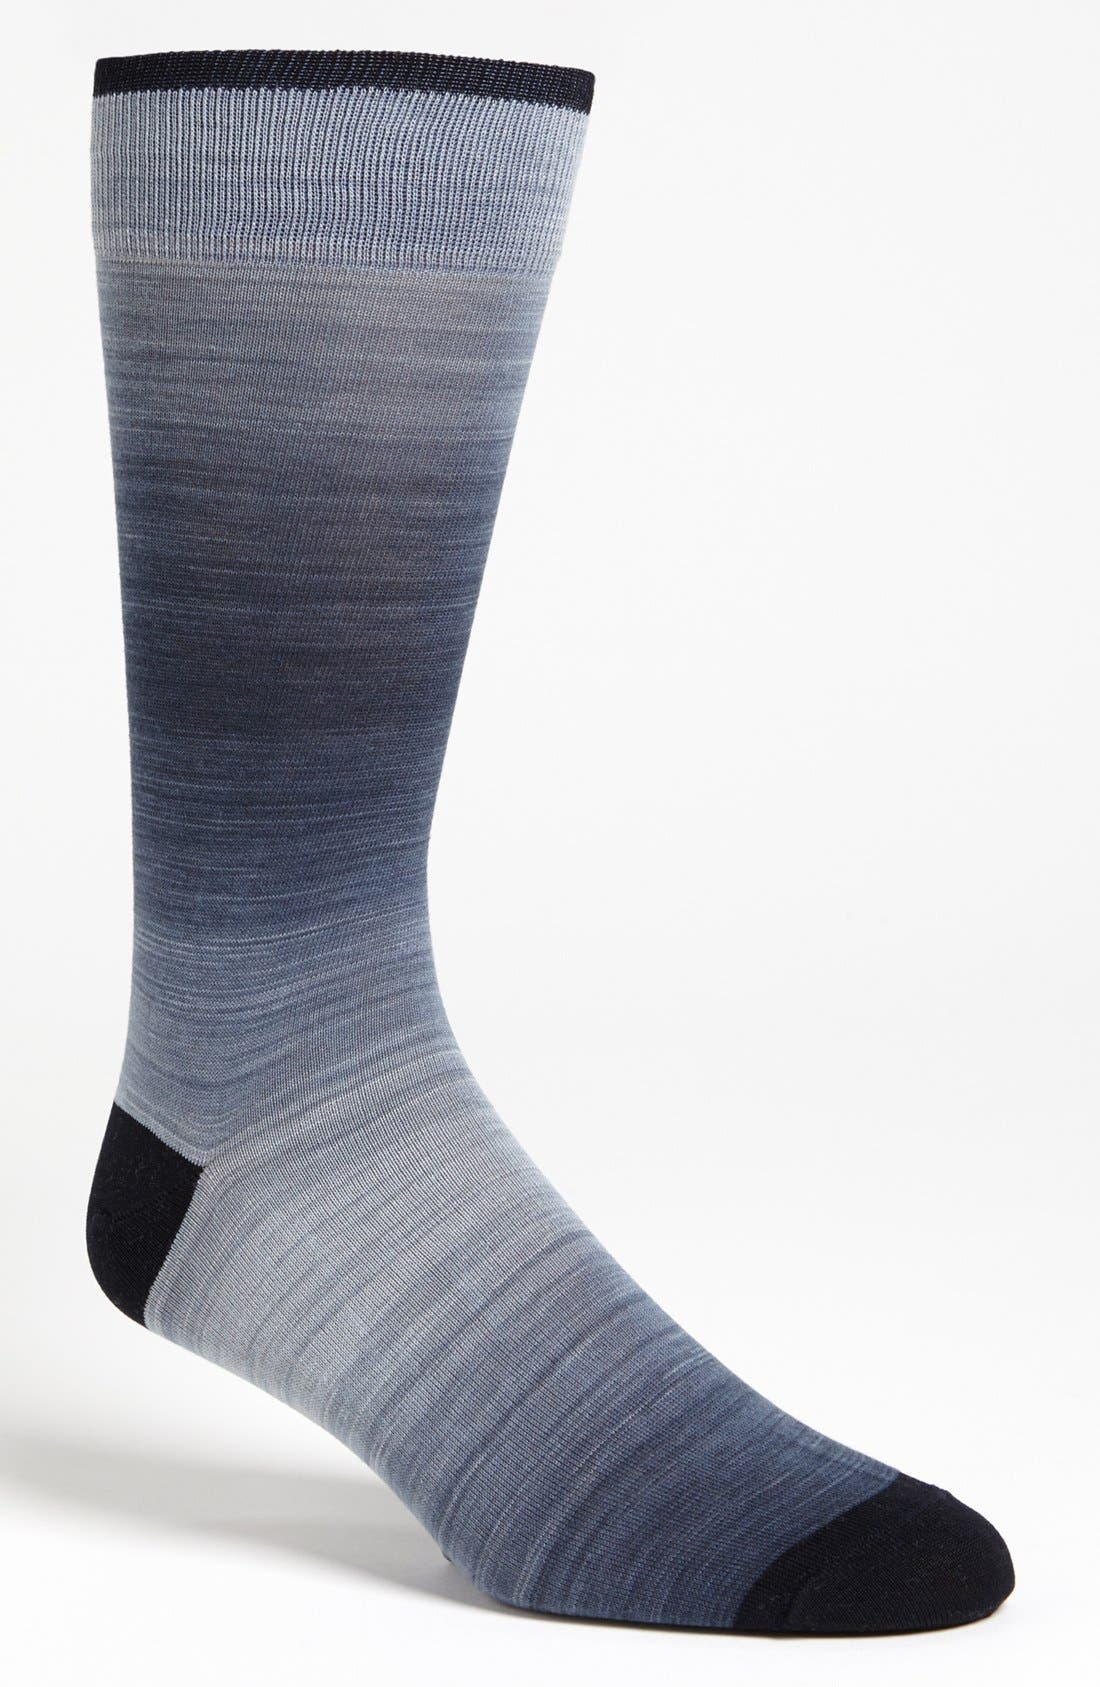 Alternate Image 1 Selected - Marcoliani 'Delave' Socks